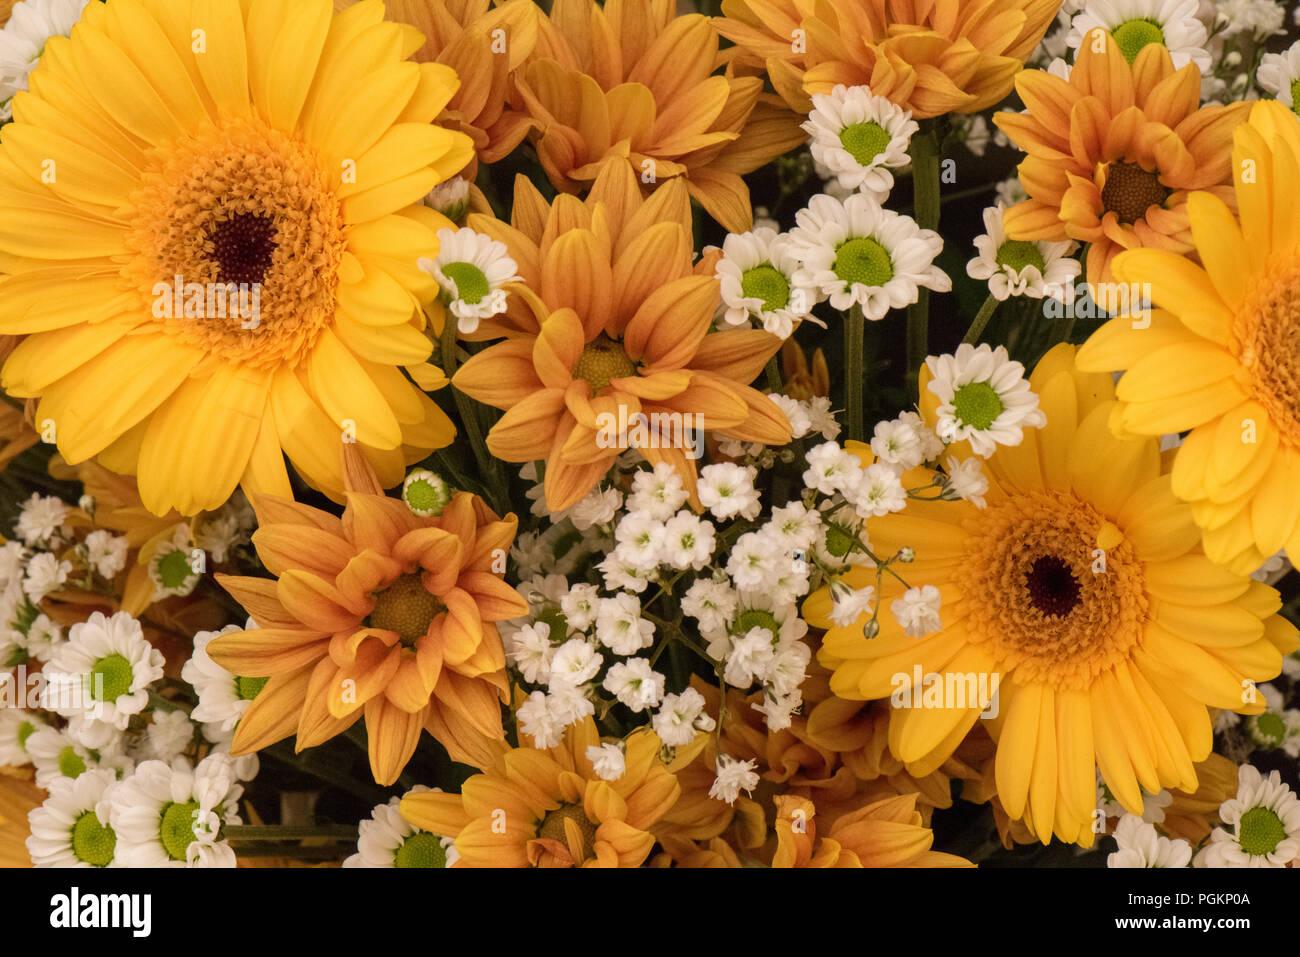 Beautiful flower display of yellow gerbera, golden and white chrysanthemums - Stock Image